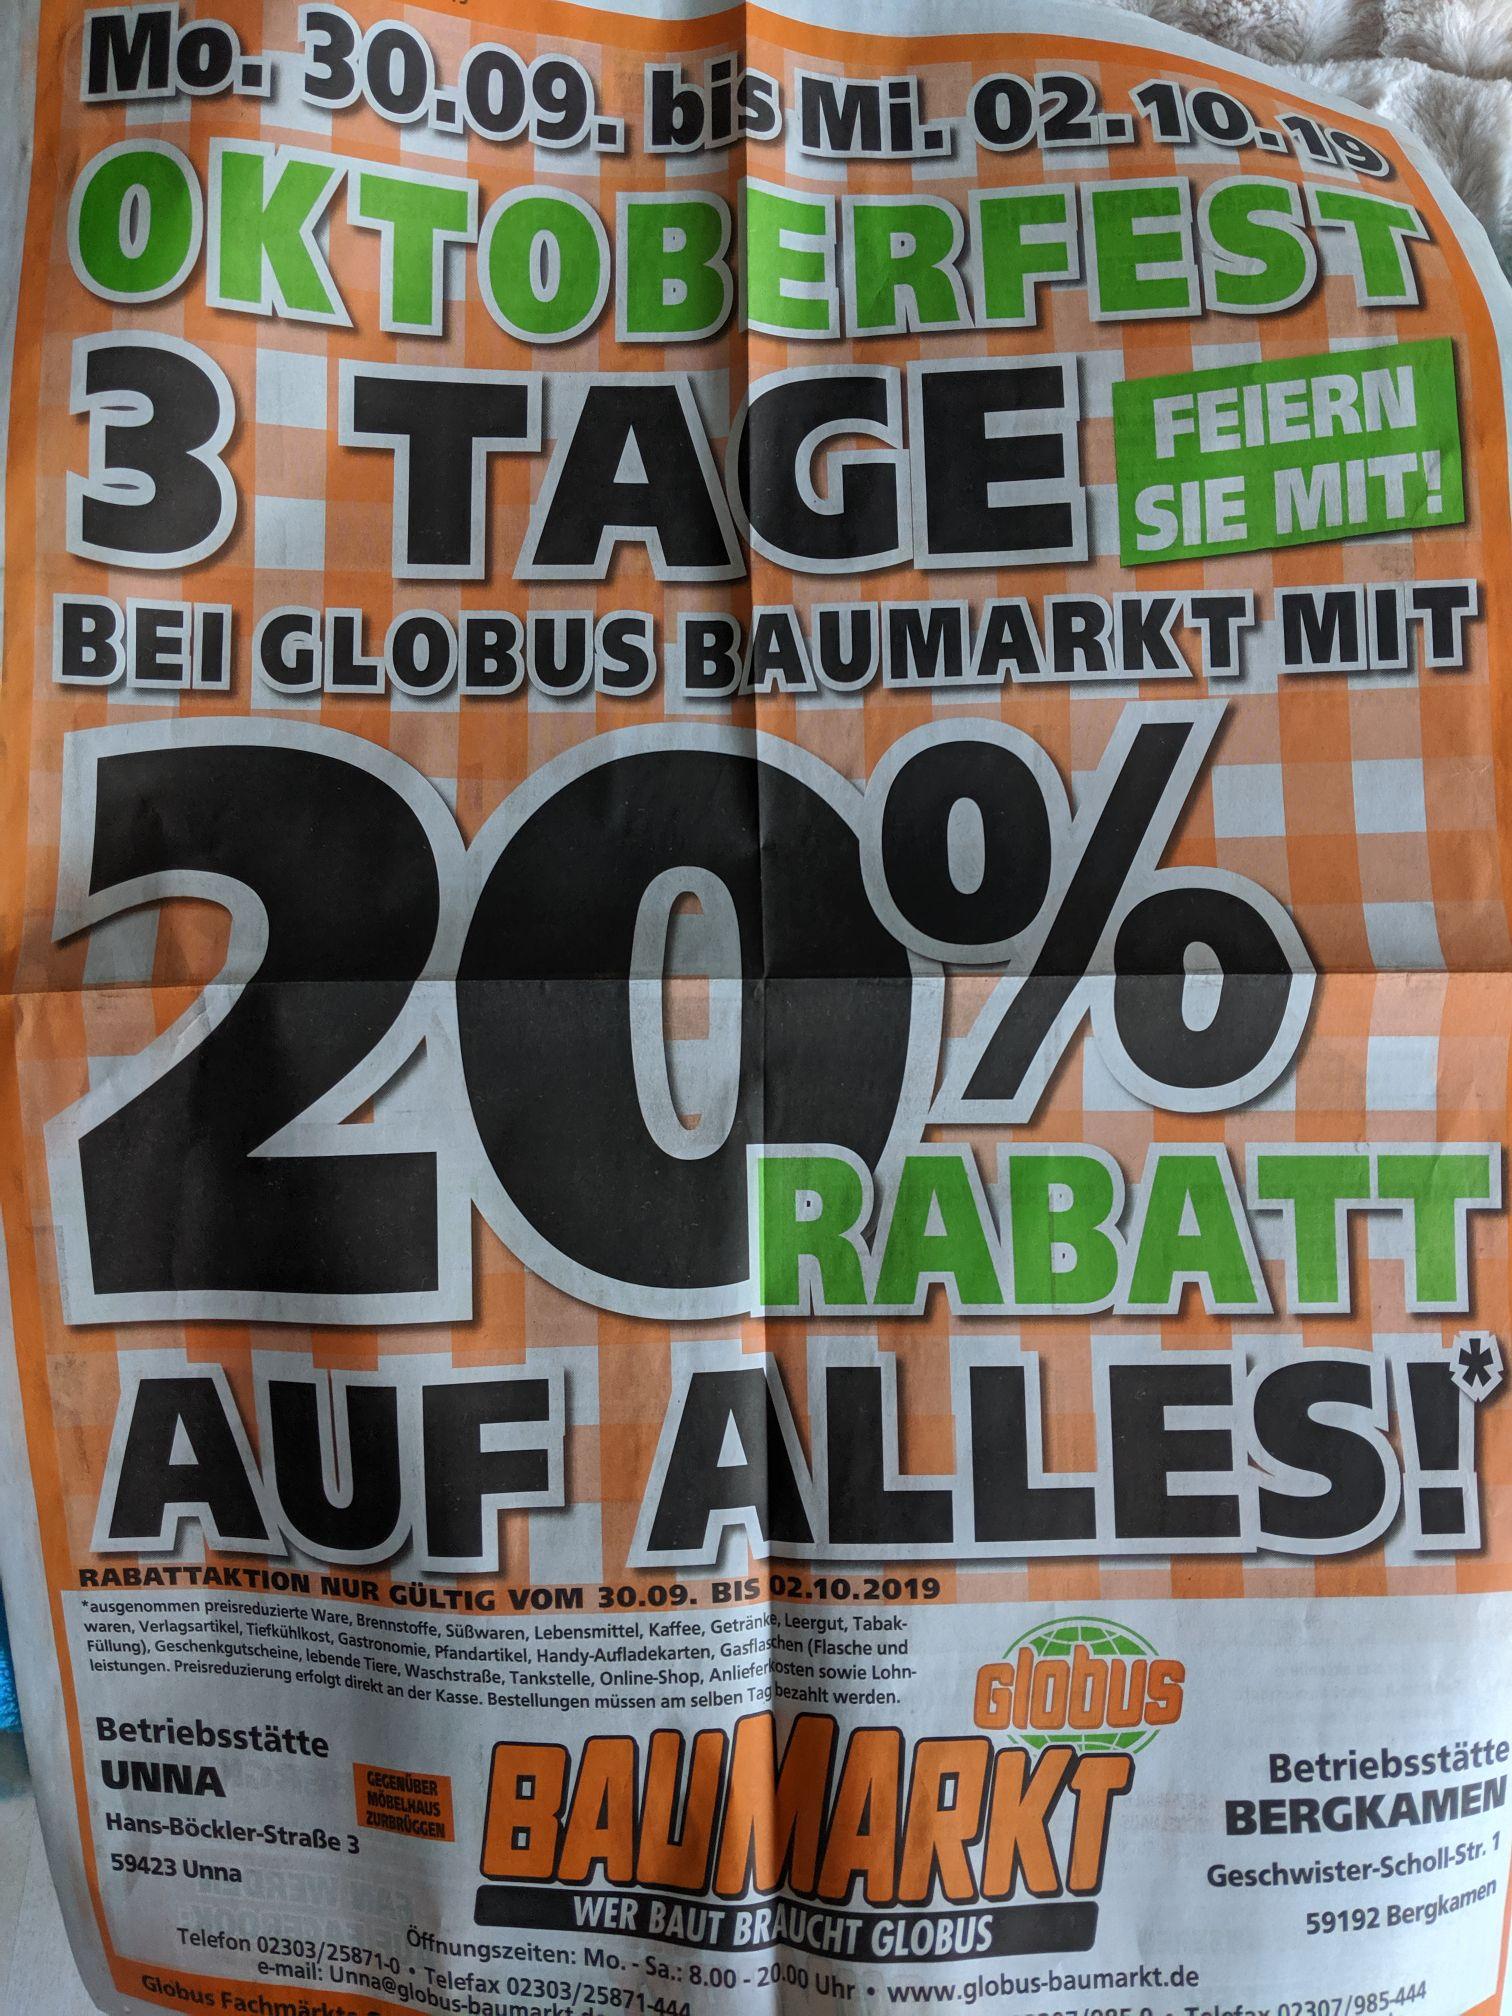 Globus Baumarkt Unna/Bergkamen 20%